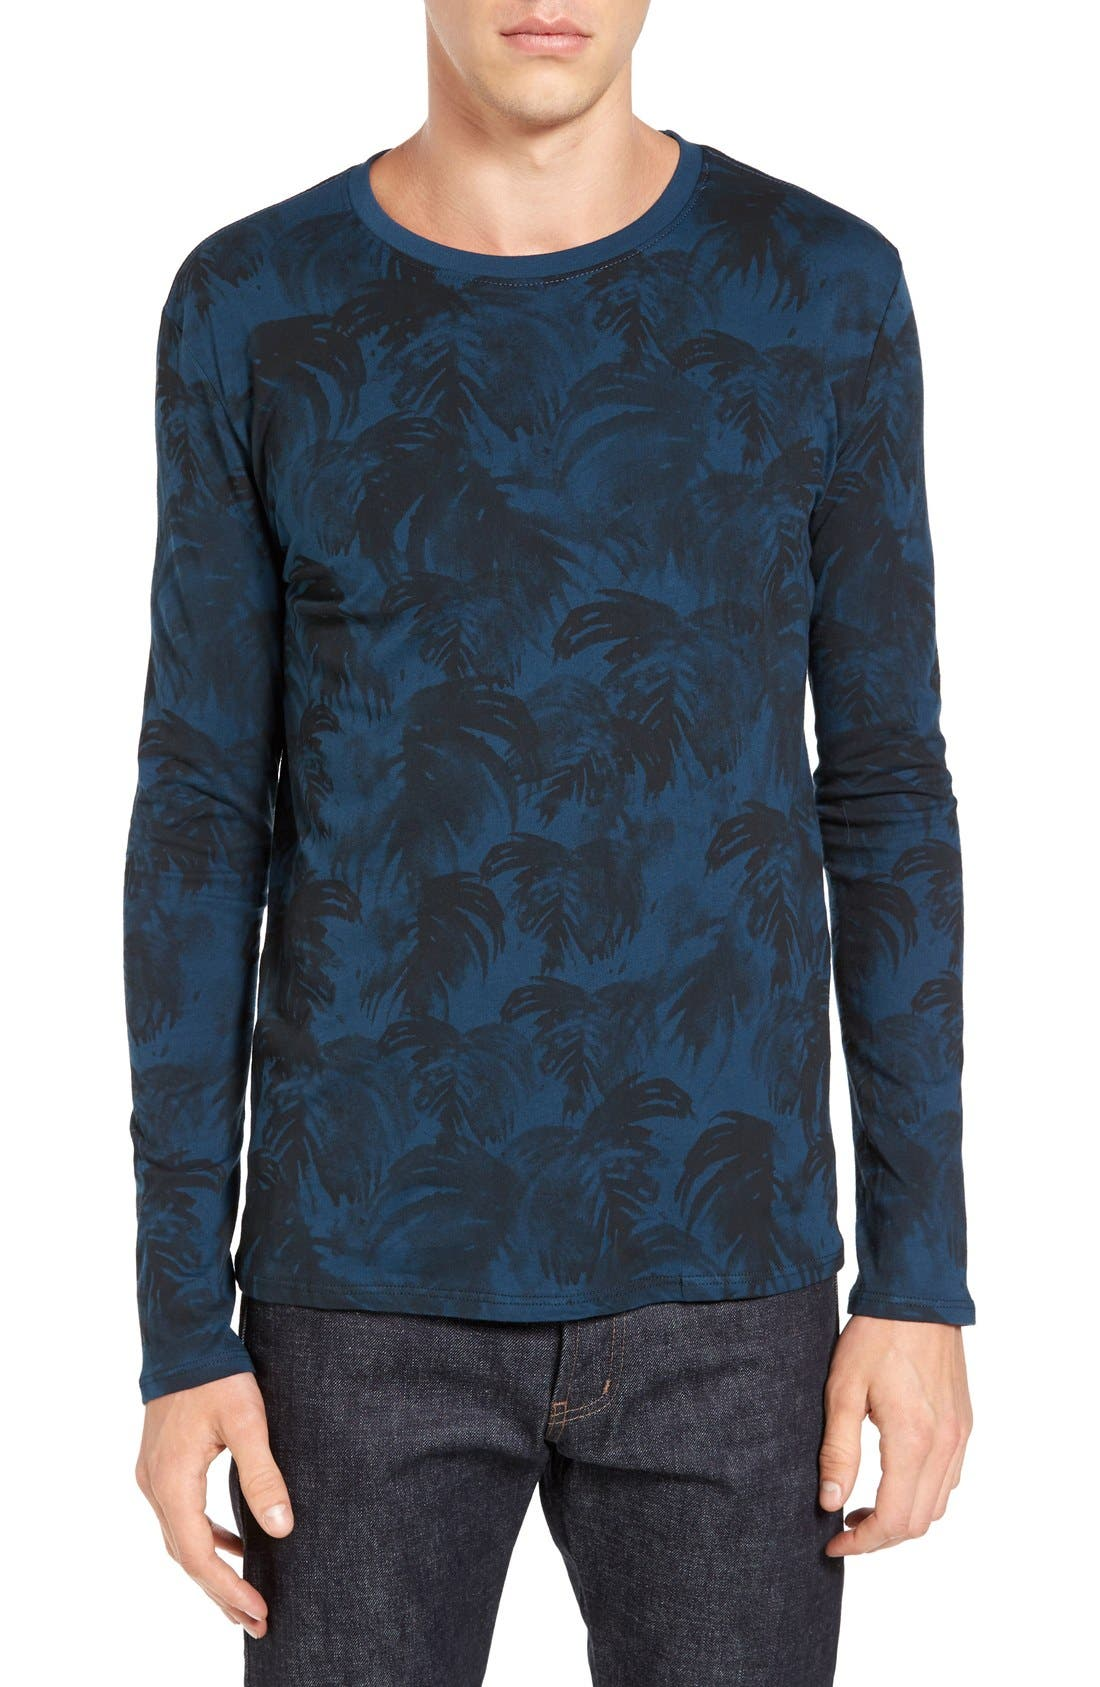 VESTIGE Canopy Palm Print T-Shirt